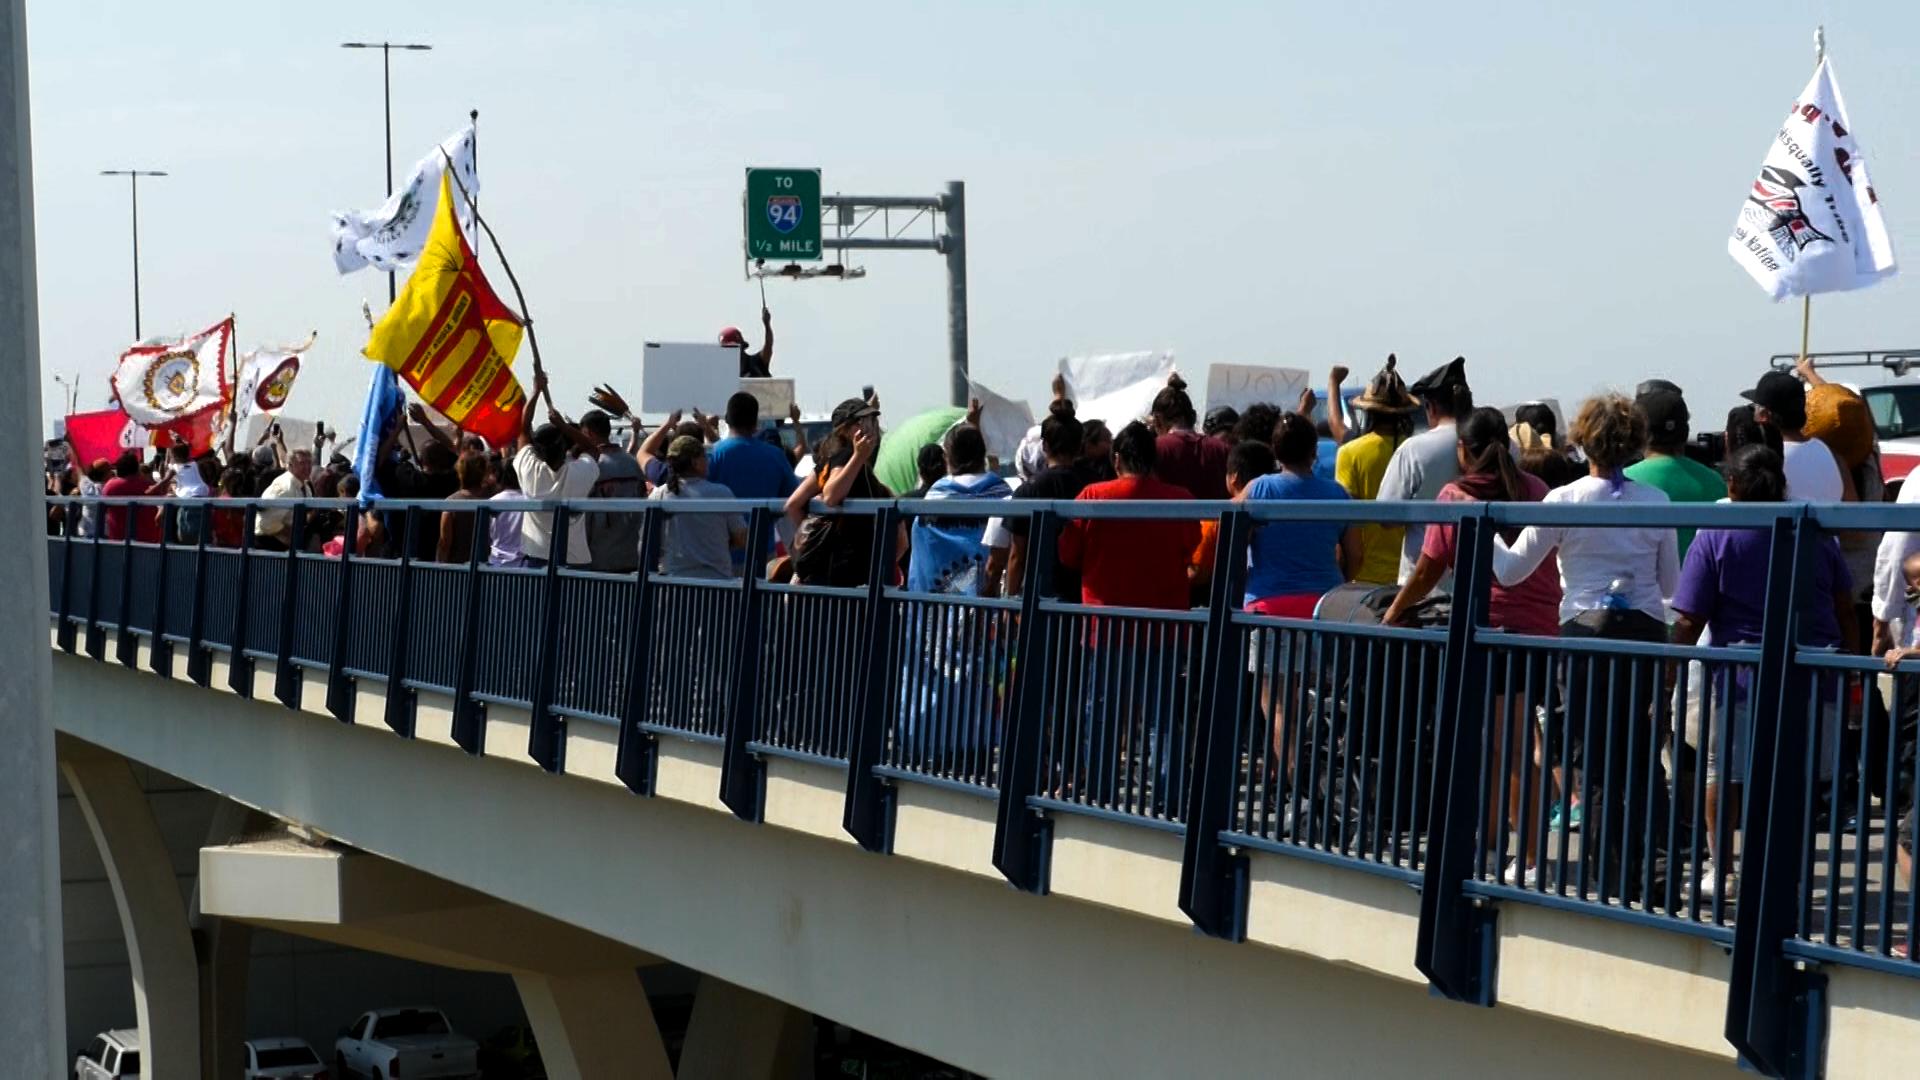 Protestors on the pedestrian path crossing the Memorial Bridge in Bismarck, ND.Photo by Mike Glatt.